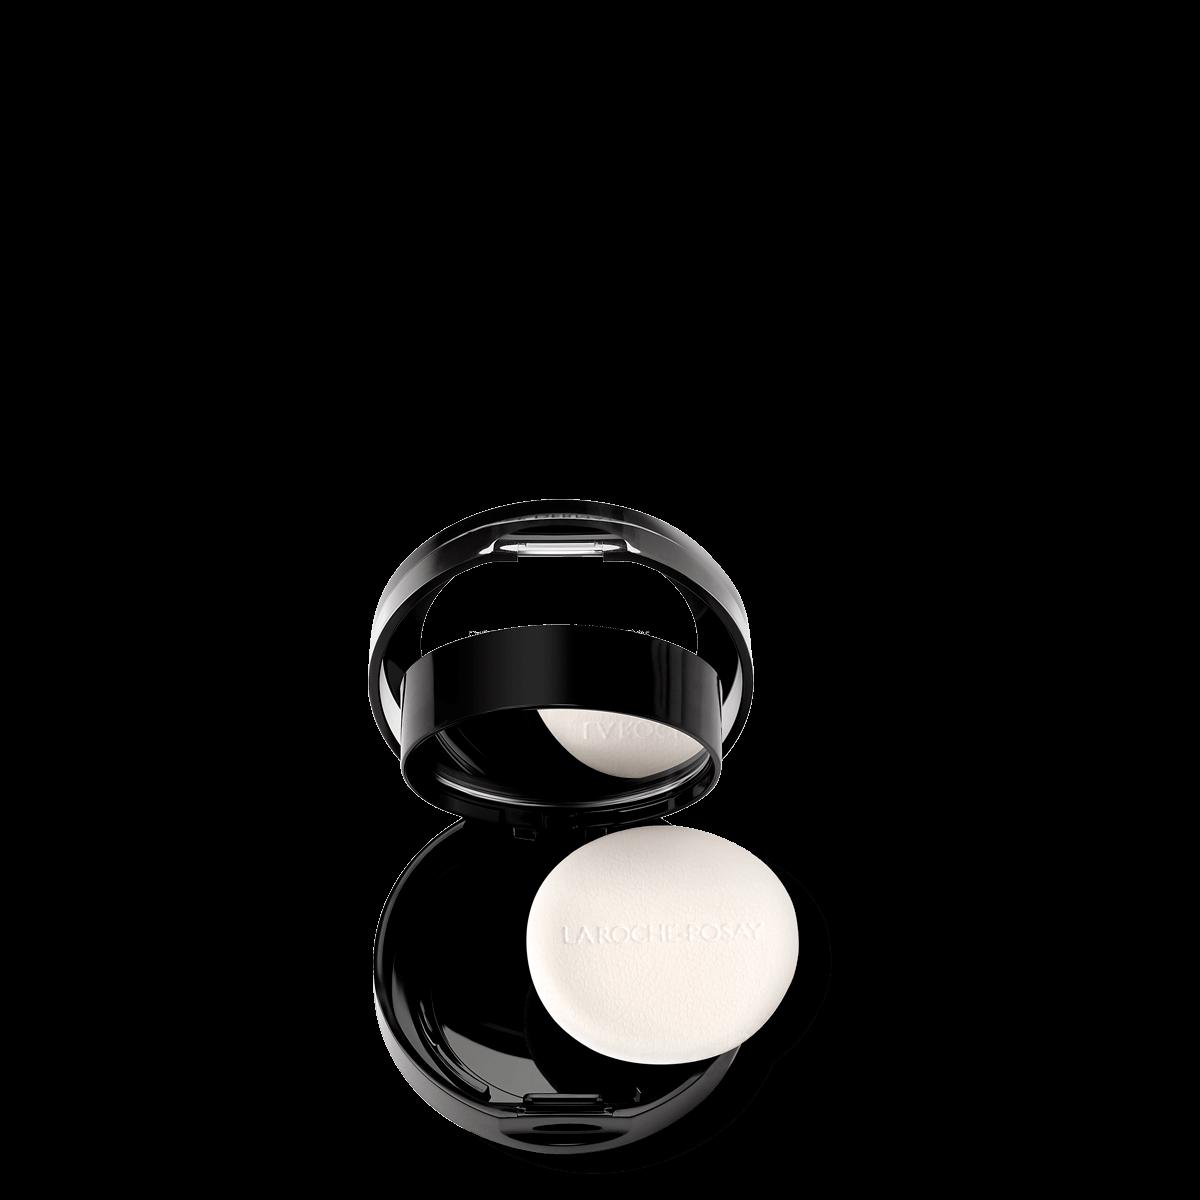 La Roche Posay Känslig Toleriane Make up BLUSH GoldenPink 30102415 O